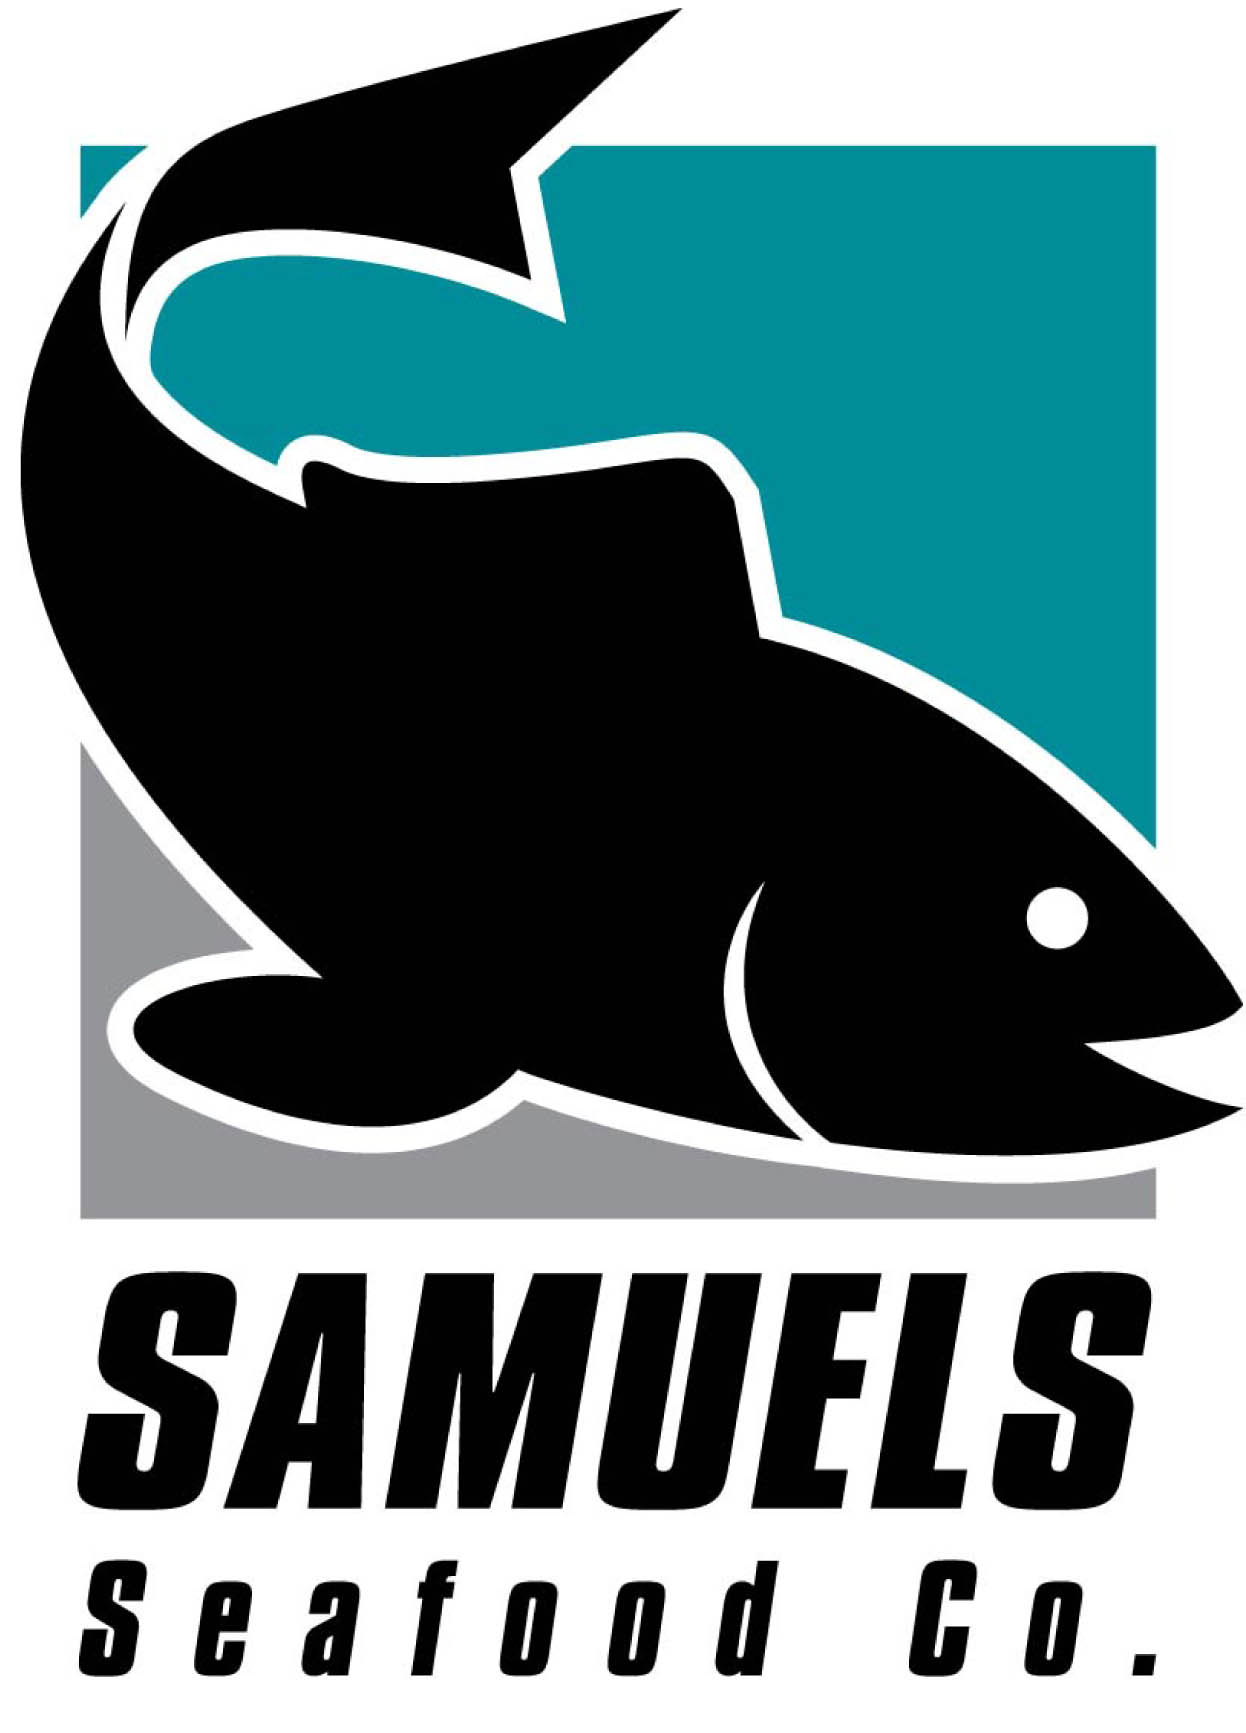 samuels-seafood.jpg